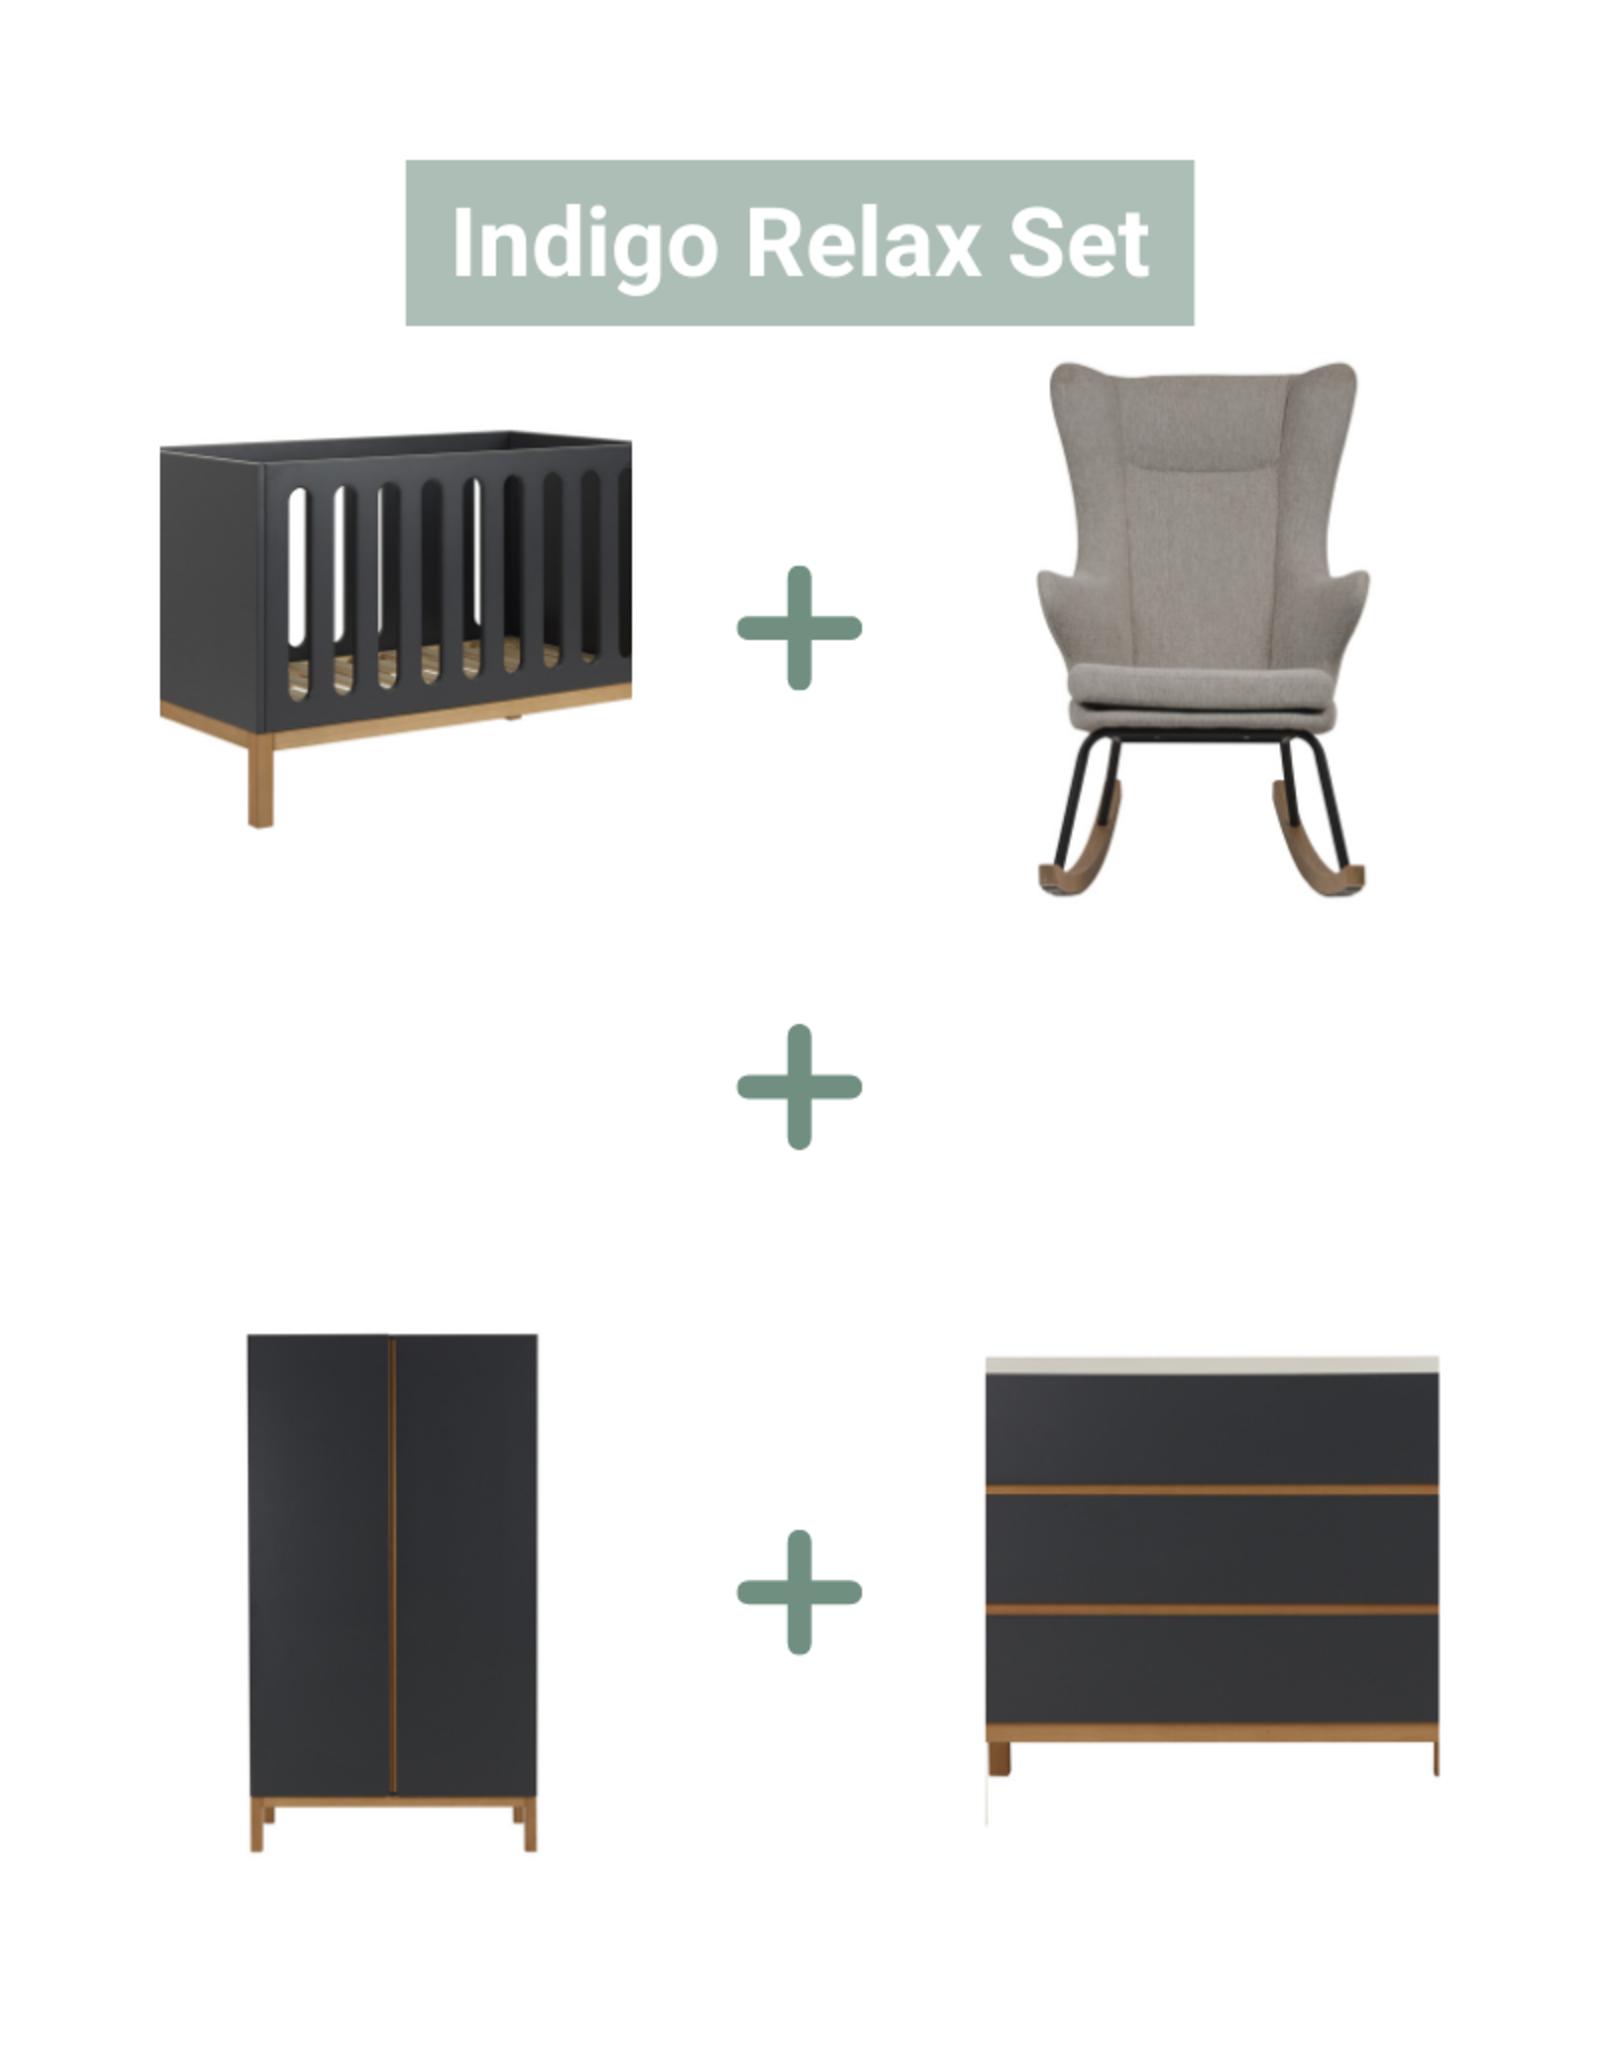 Quax Indigo Relax Set